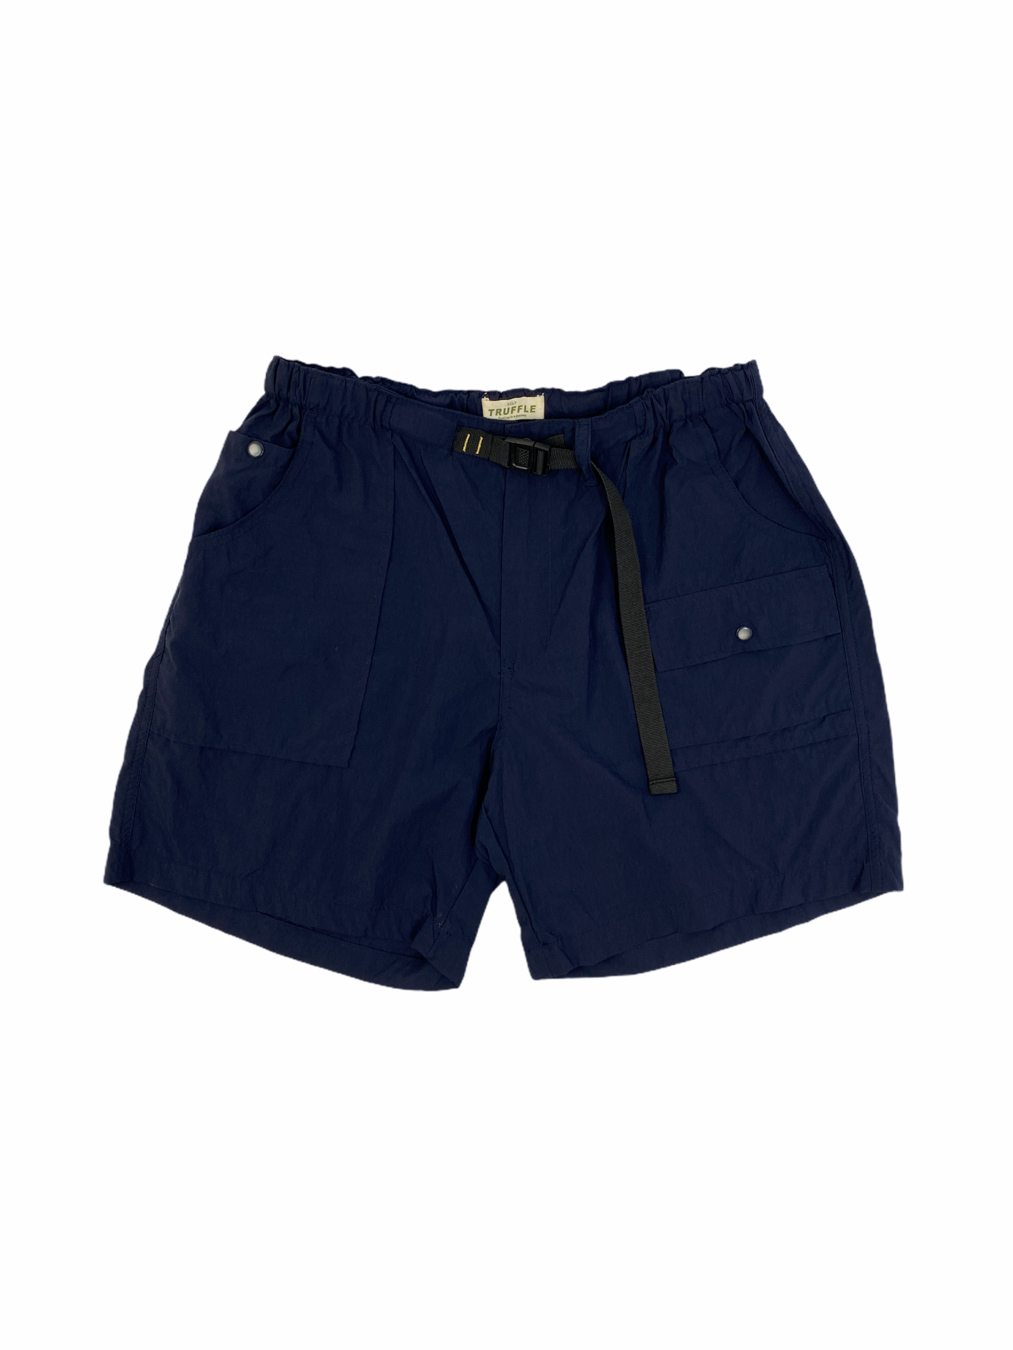 Nylon Pants (Navy)